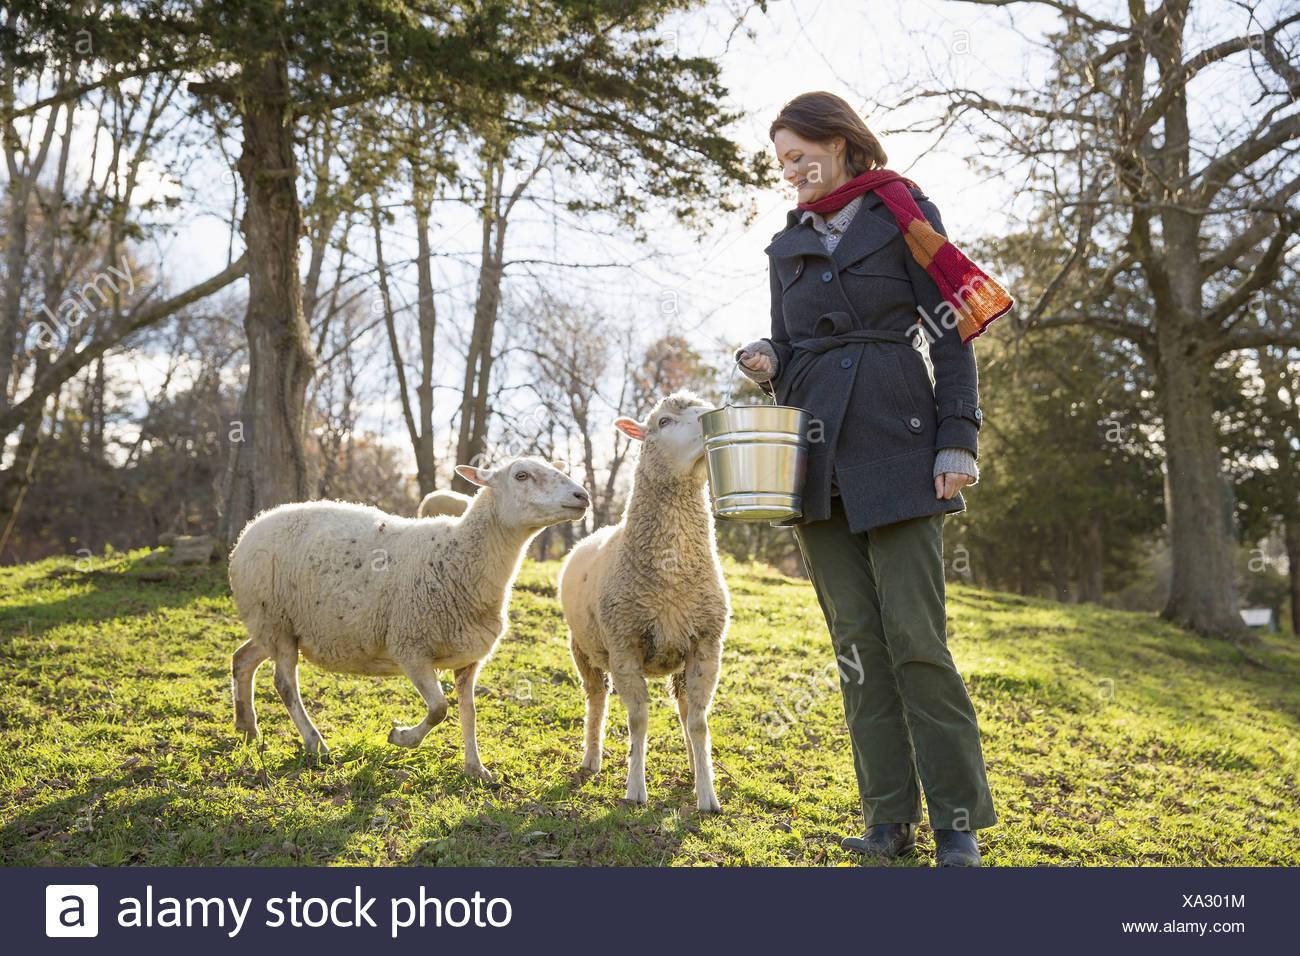 Sheep Pen Stock Photos & Sheep Pen Stock Images - Alamy